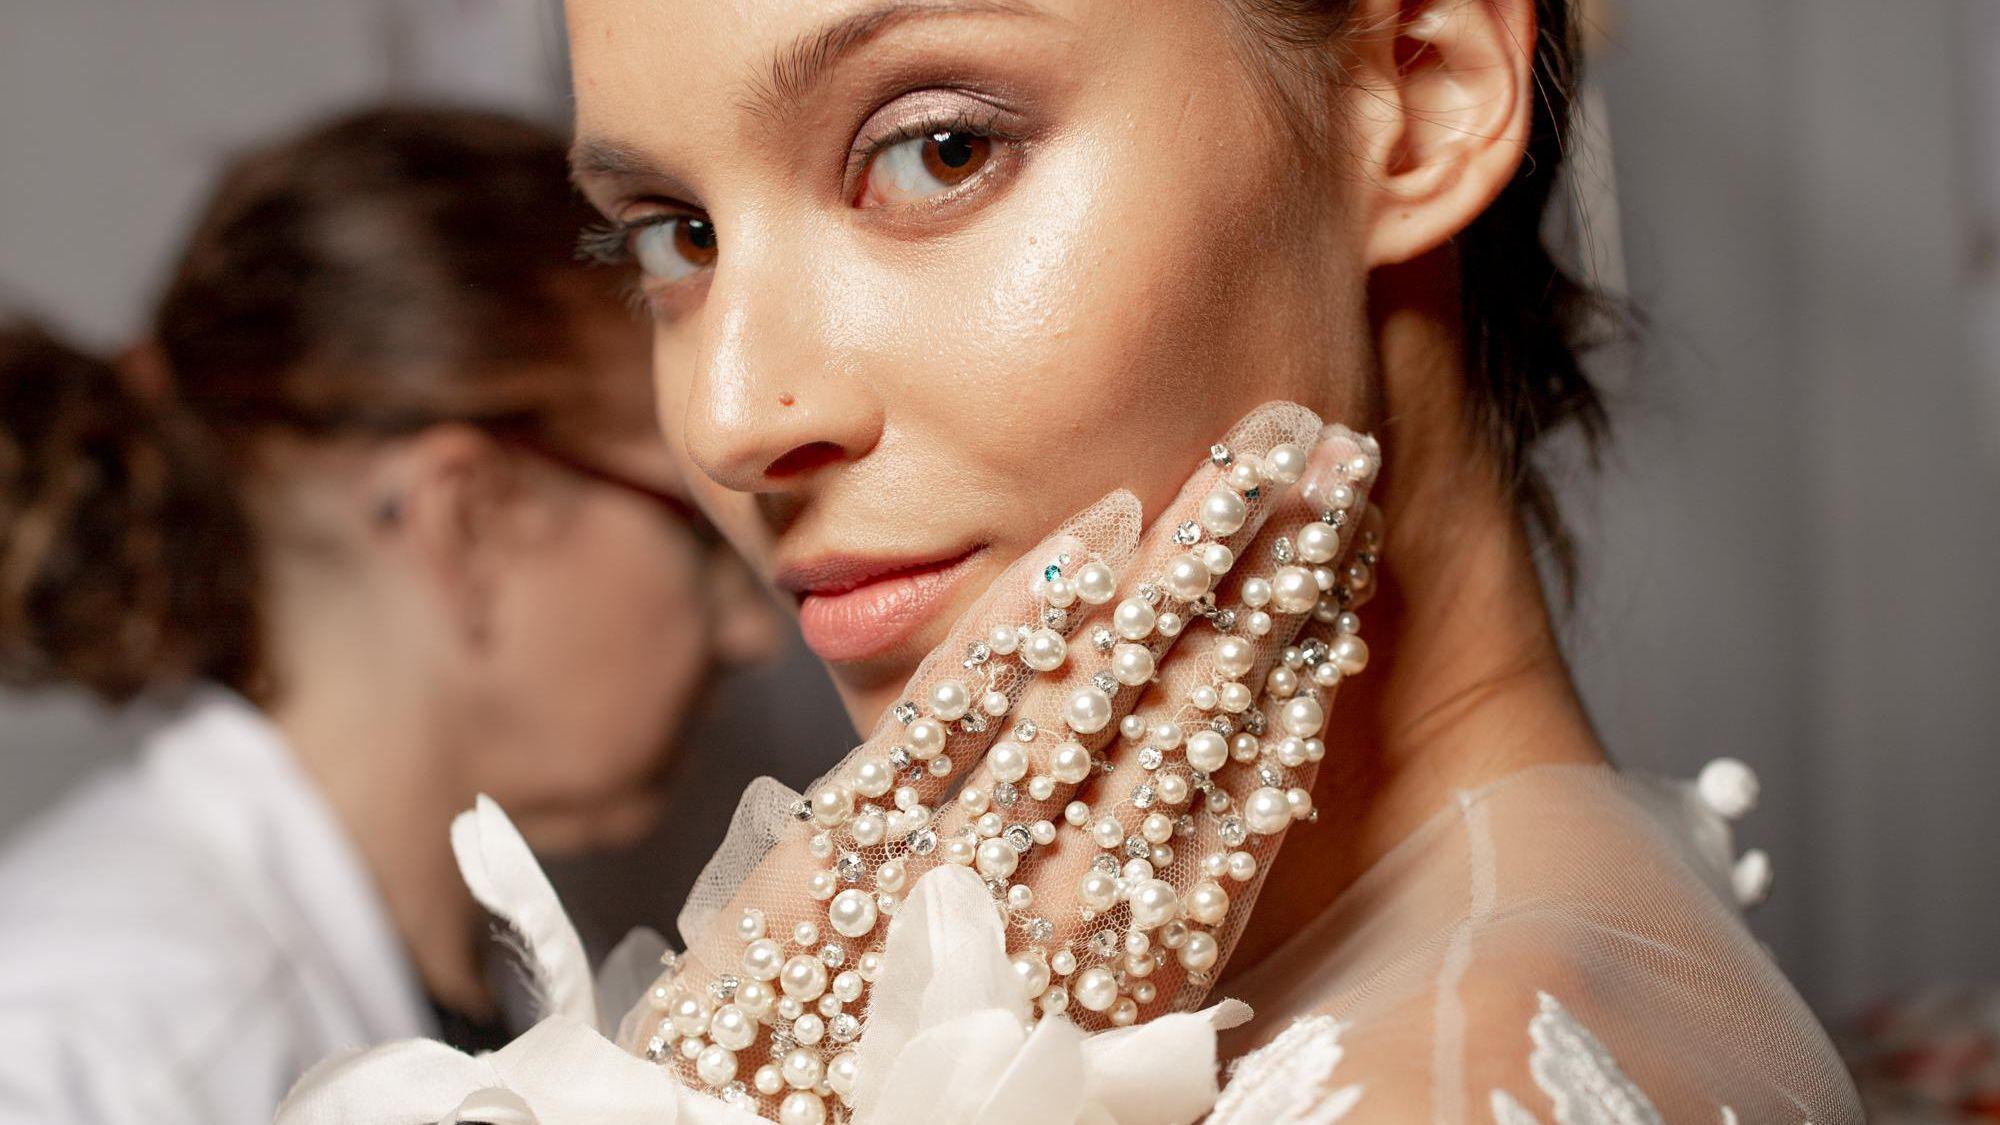 How to Plan and Start a Wedding Beauty Regimen